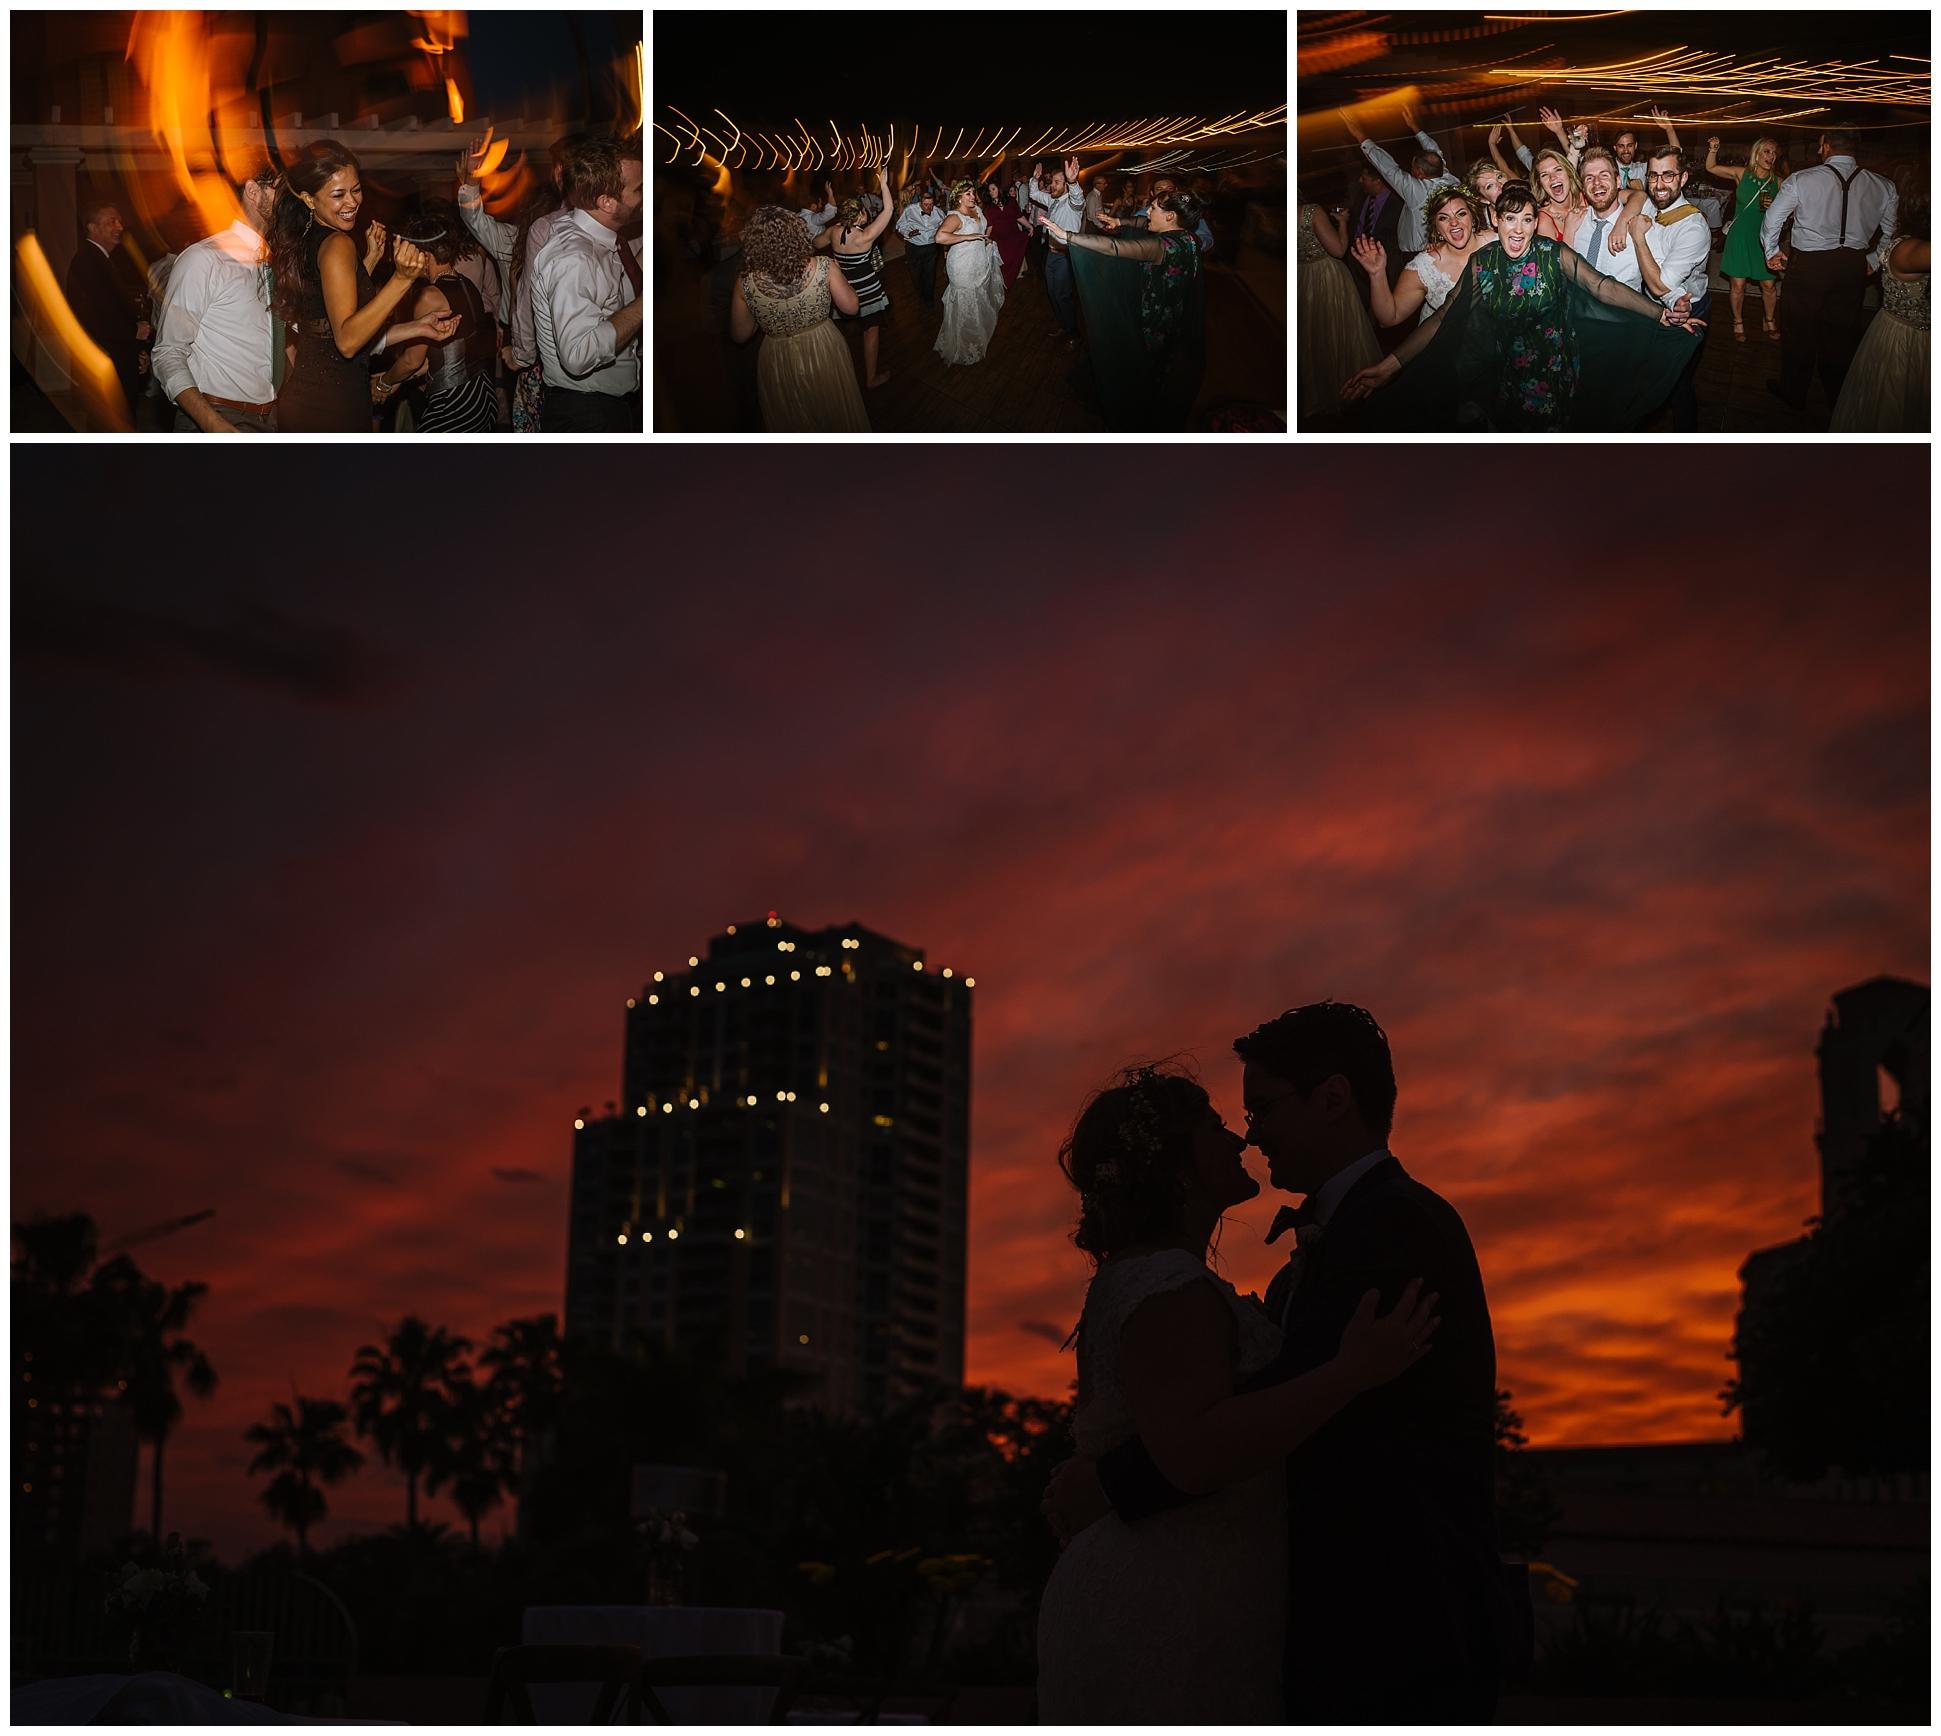 st-pete-wedding-photographer-italian-romance-theme-rustic-flower-crown_0448.jpg